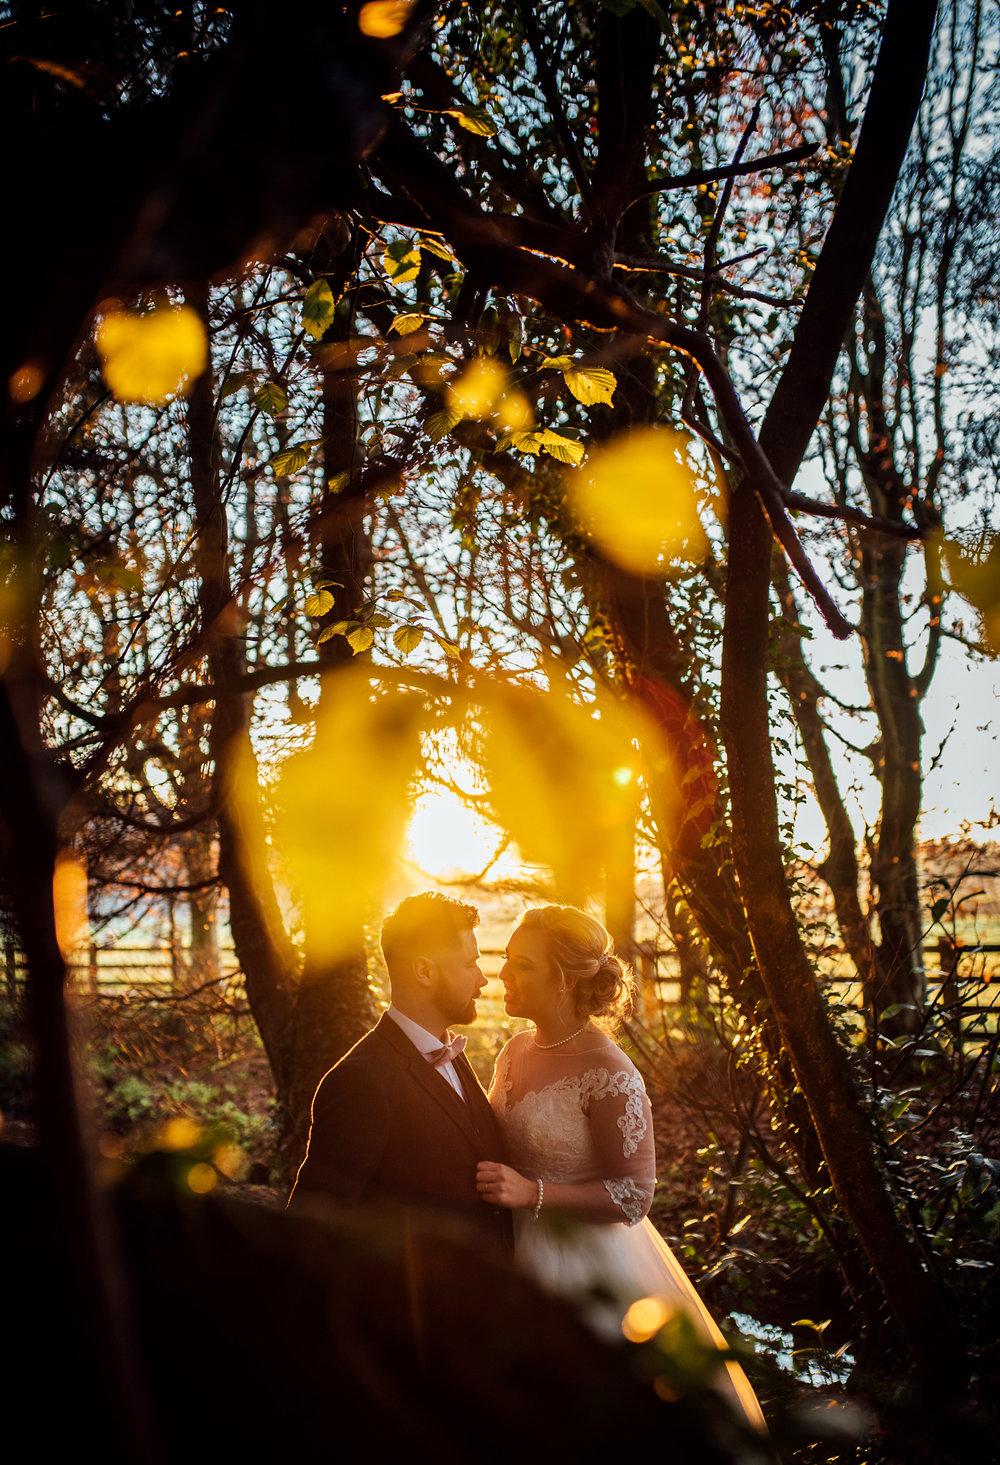 David Scholes Lancashire wedding photography 2016-39.jpg